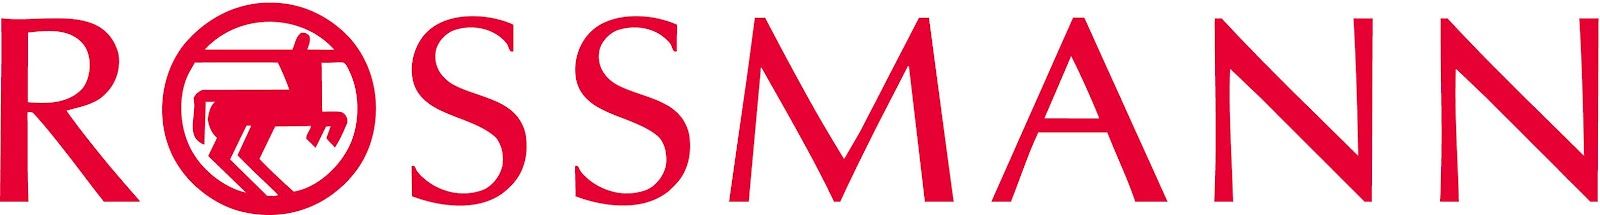 logo_rossmann_1.jpg